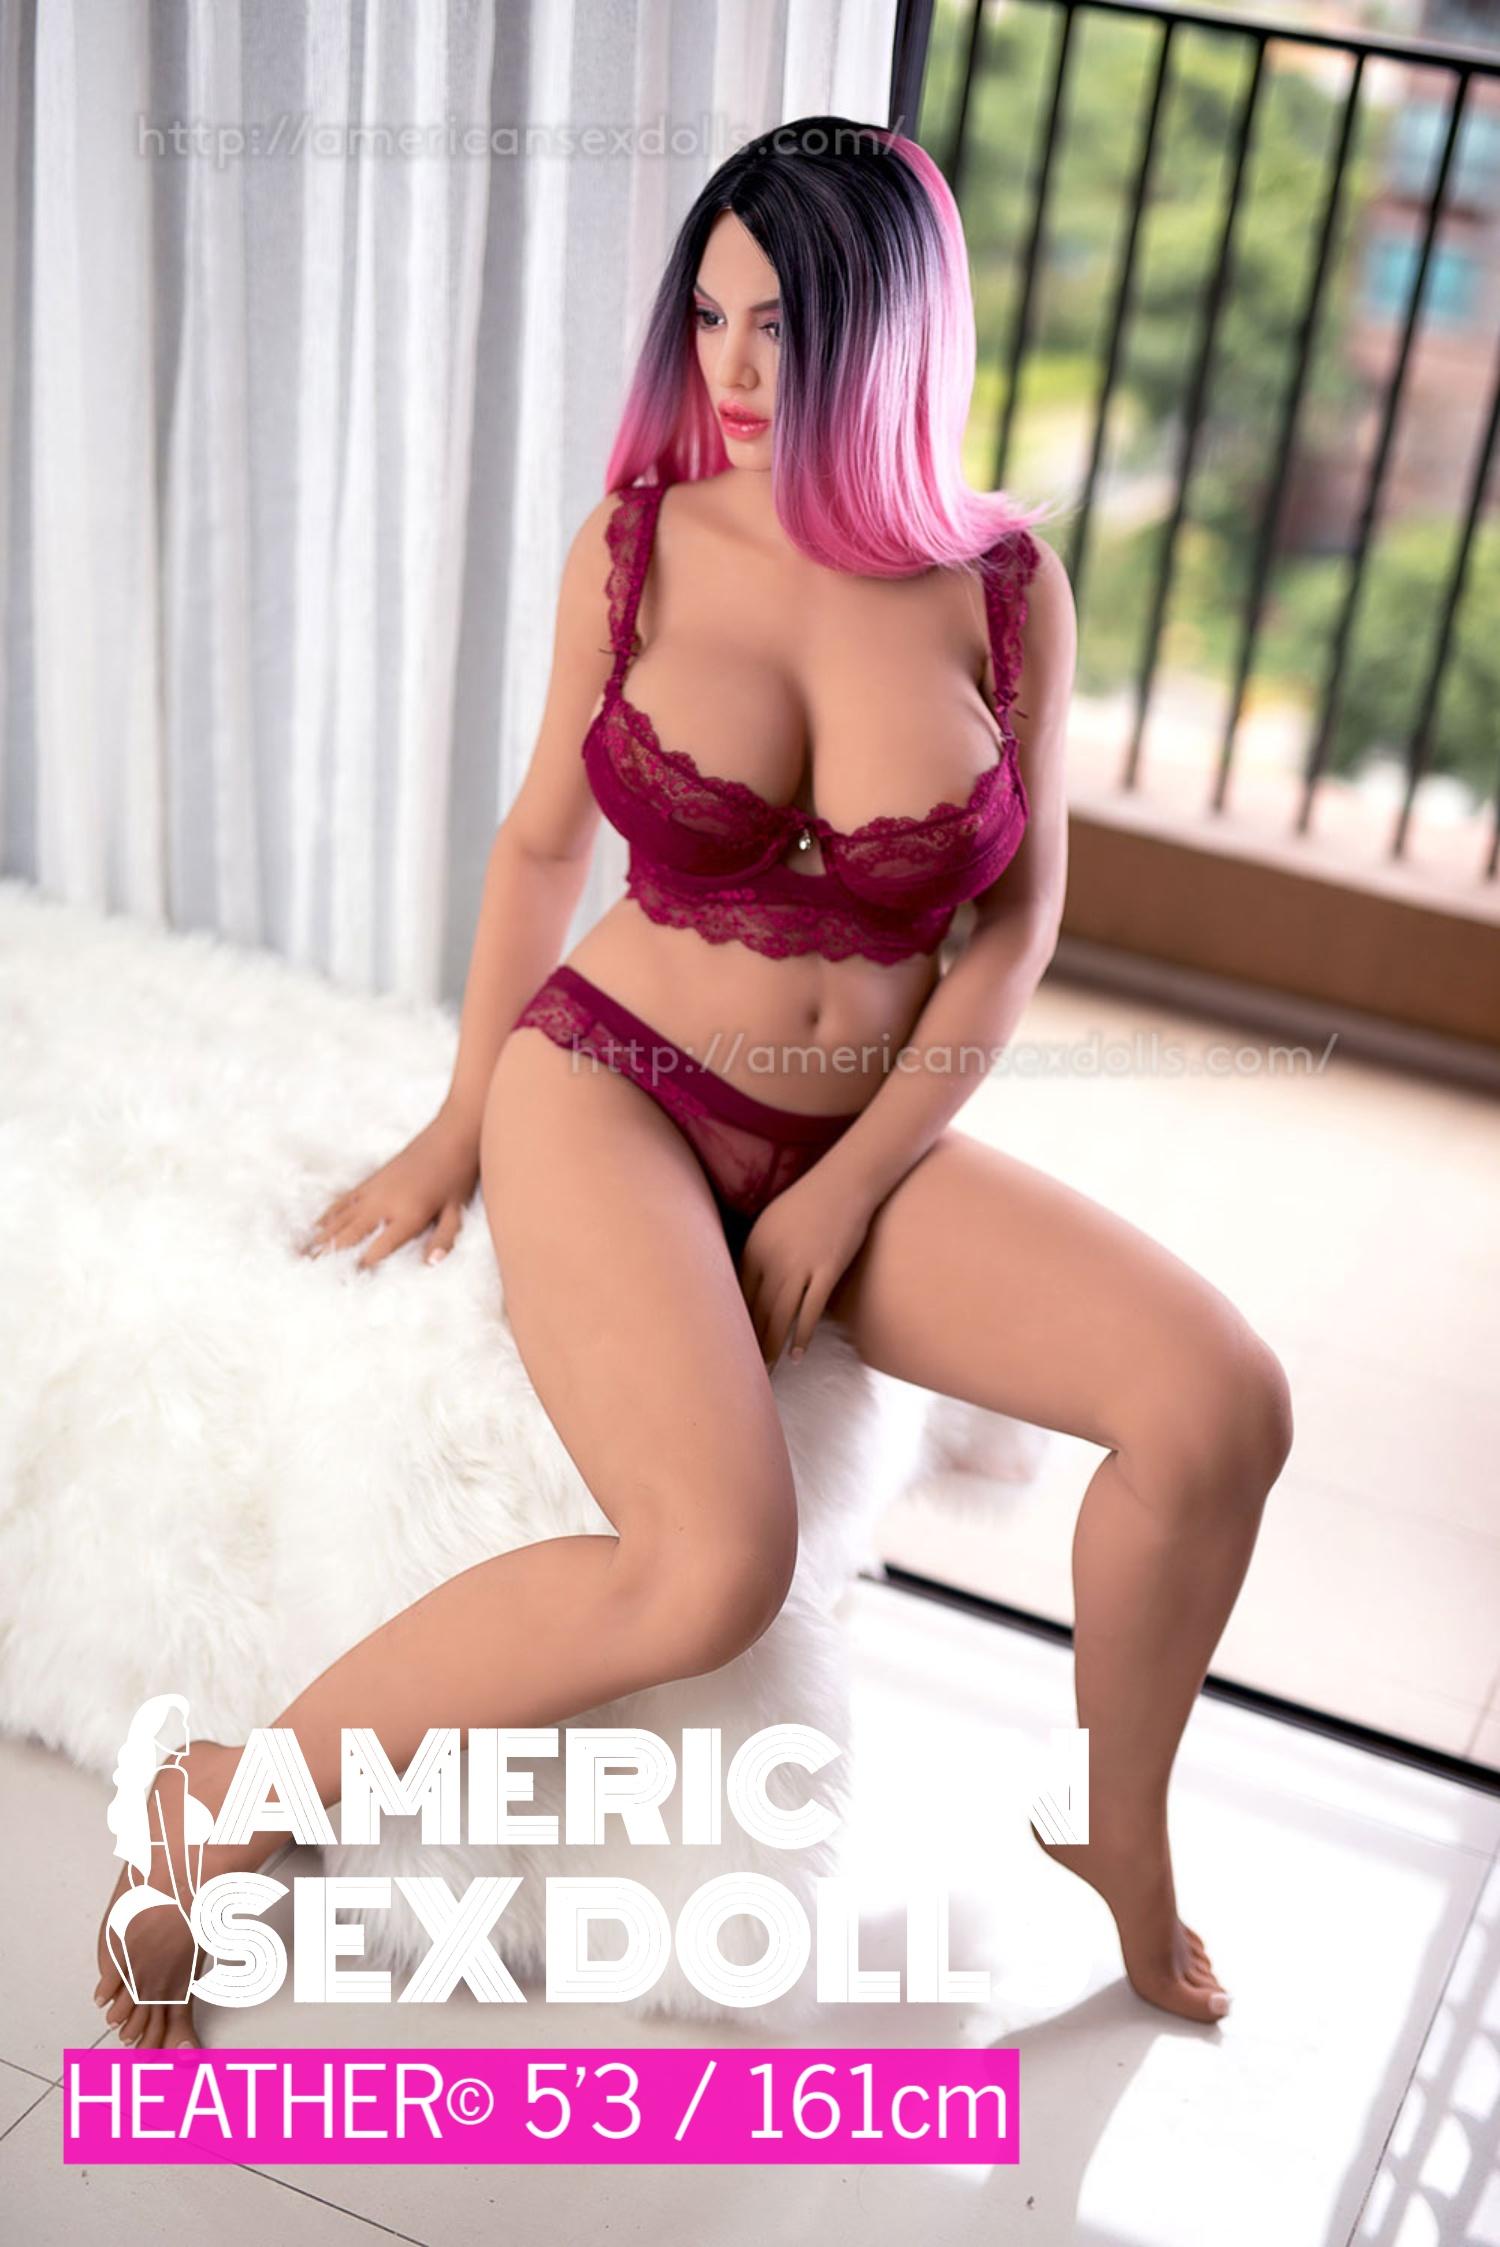 American Sex Dolls 6Ye Premium 161cm 33 (1).jpg